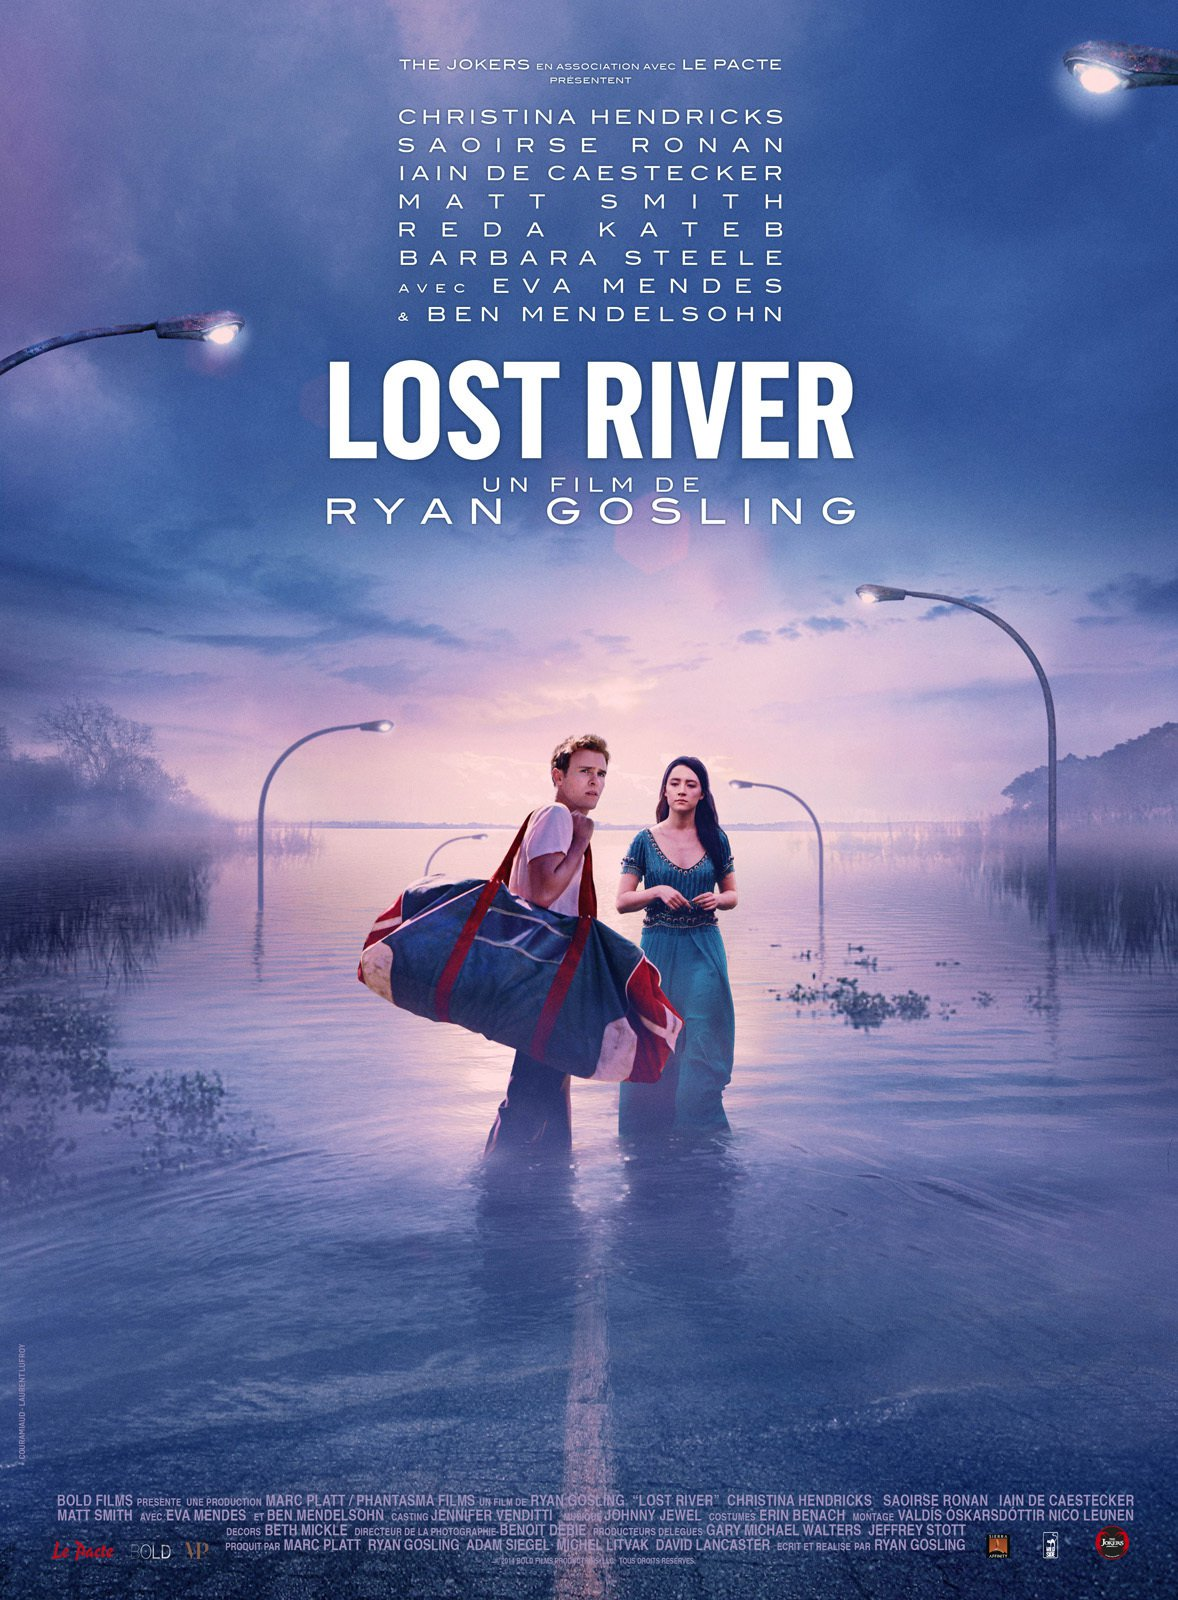 affiche du film Lost River